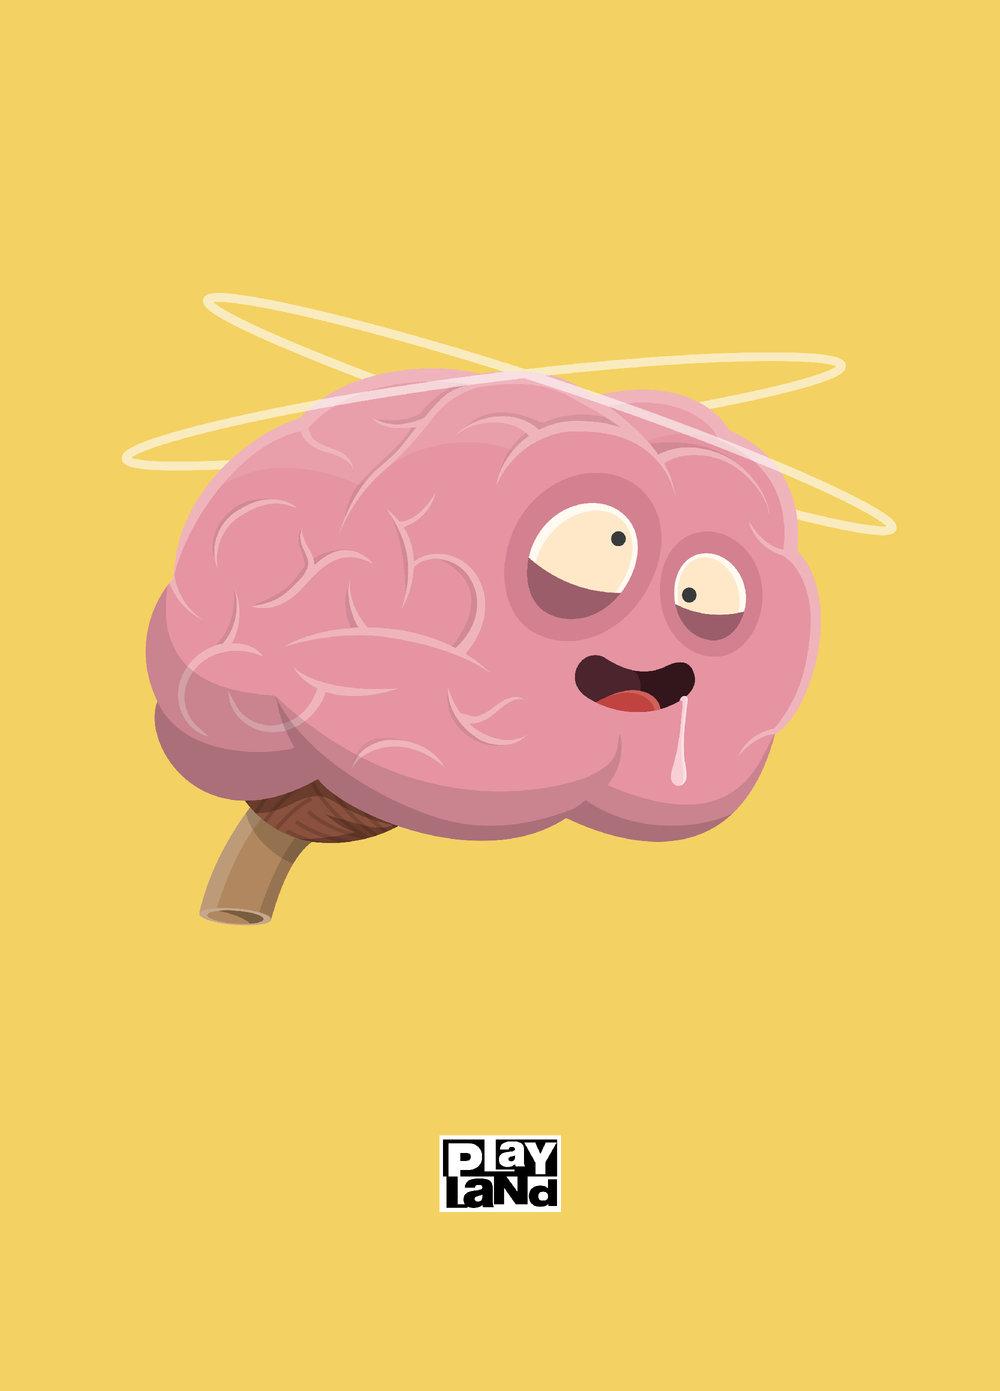 Playland-organs_brain.jpg